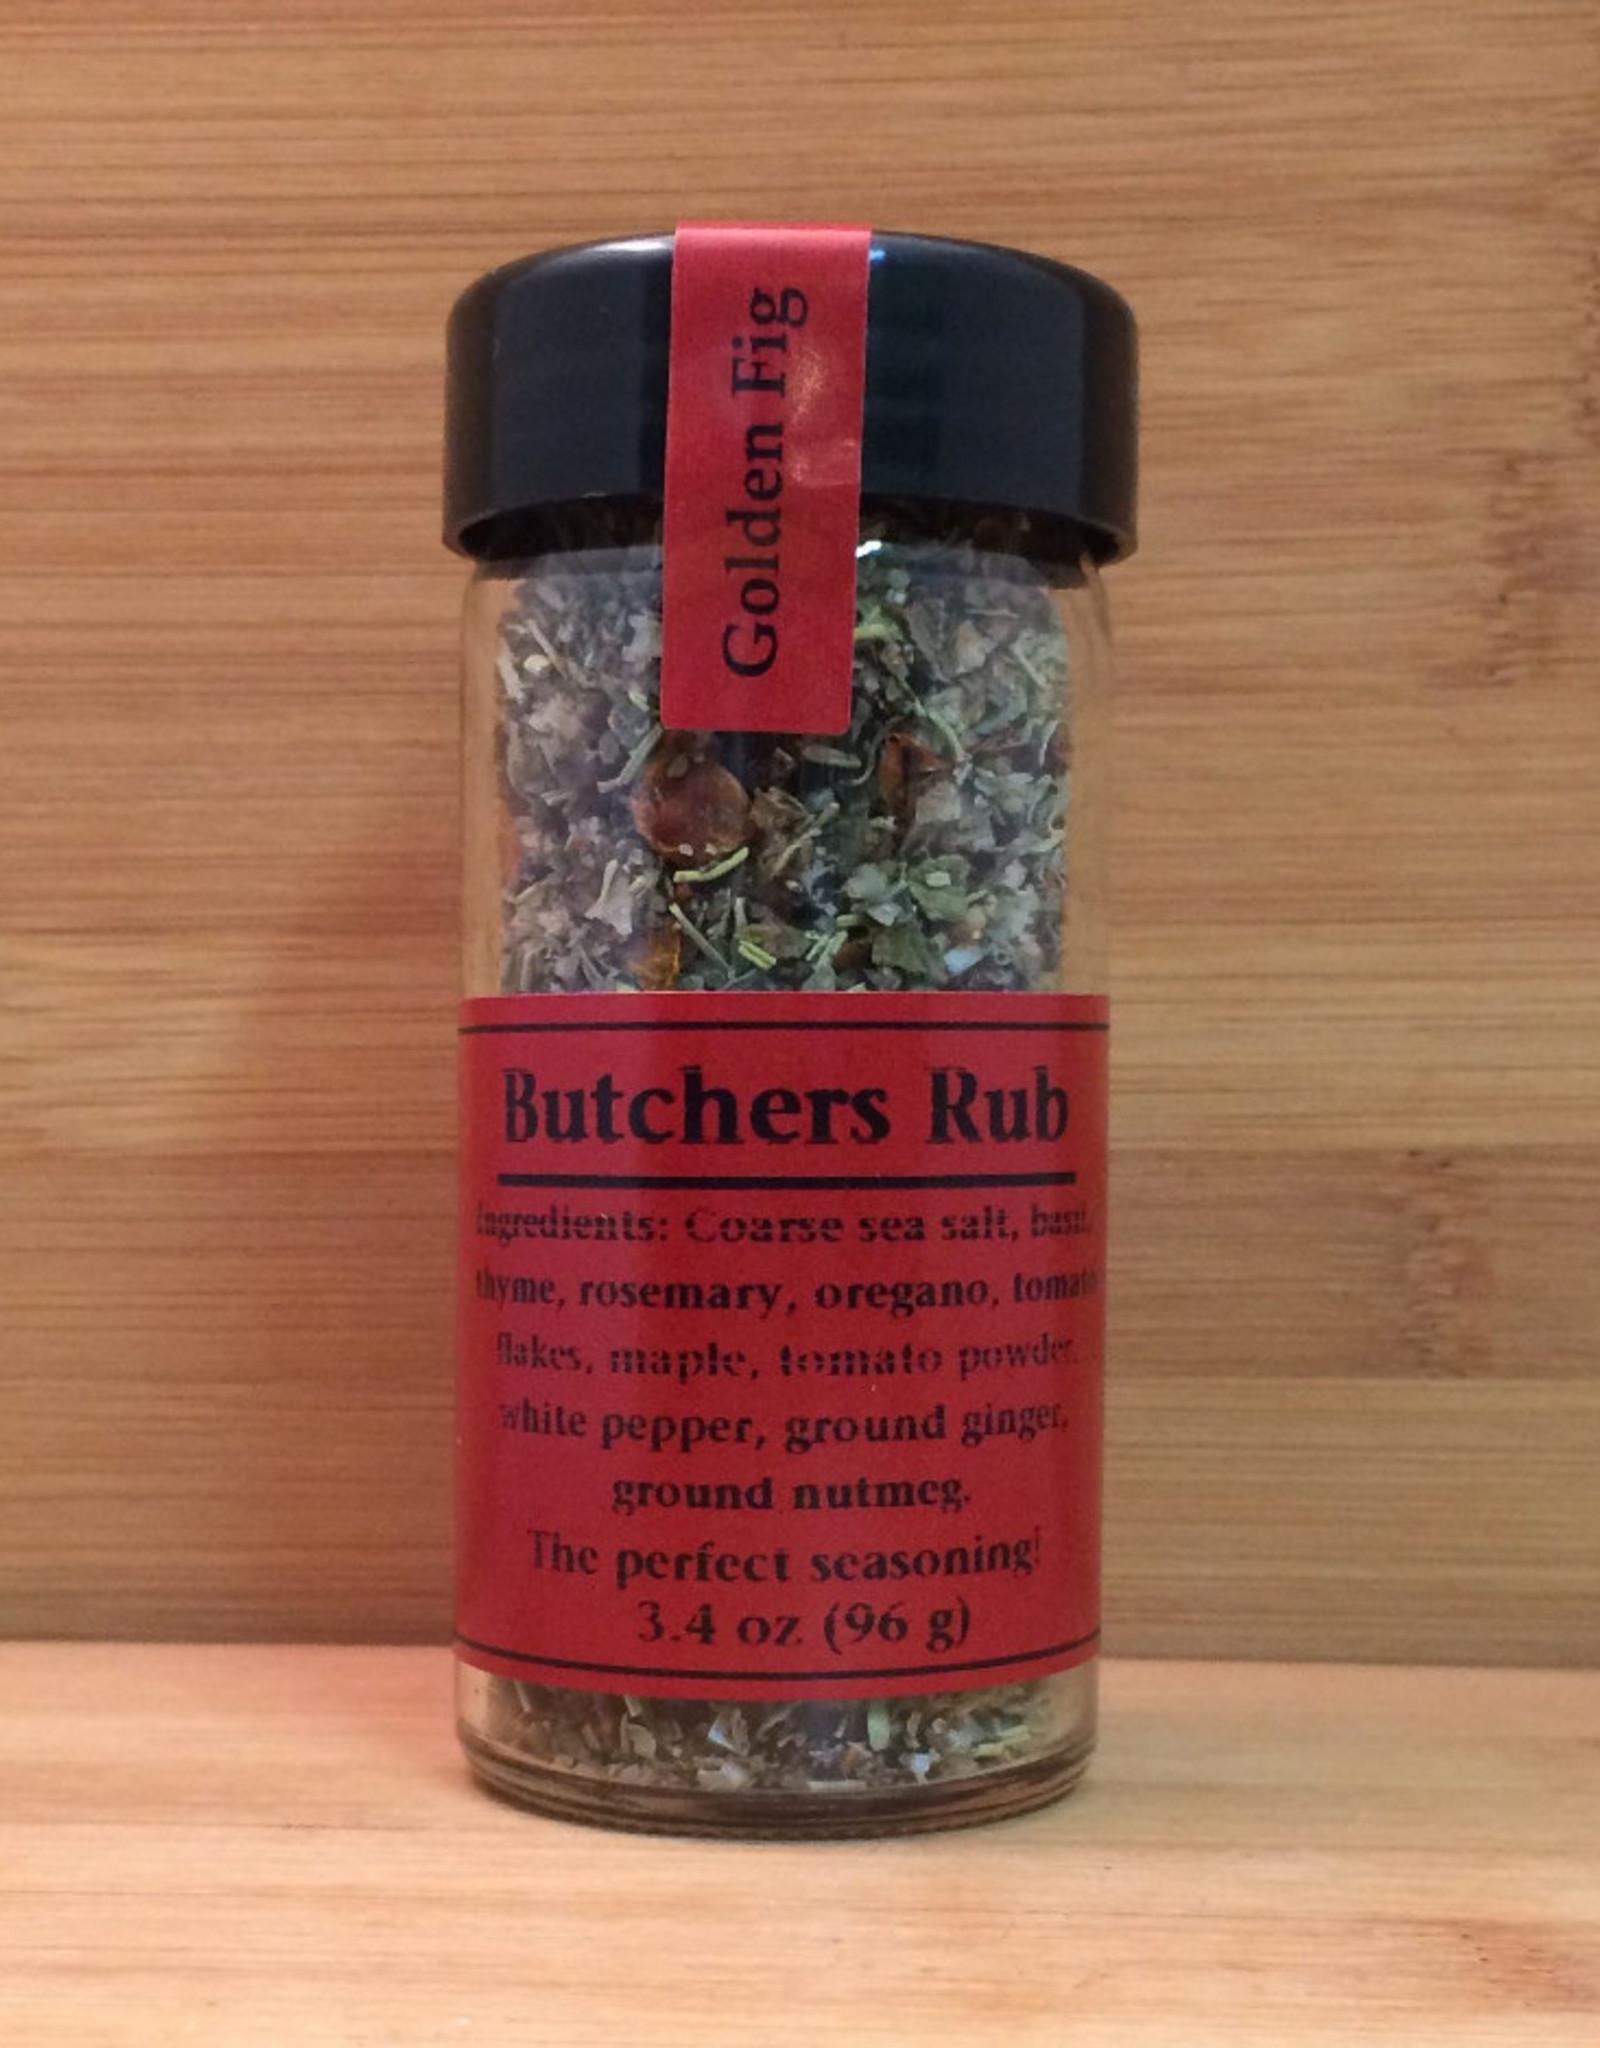 Golden Fig Butcher's Rub